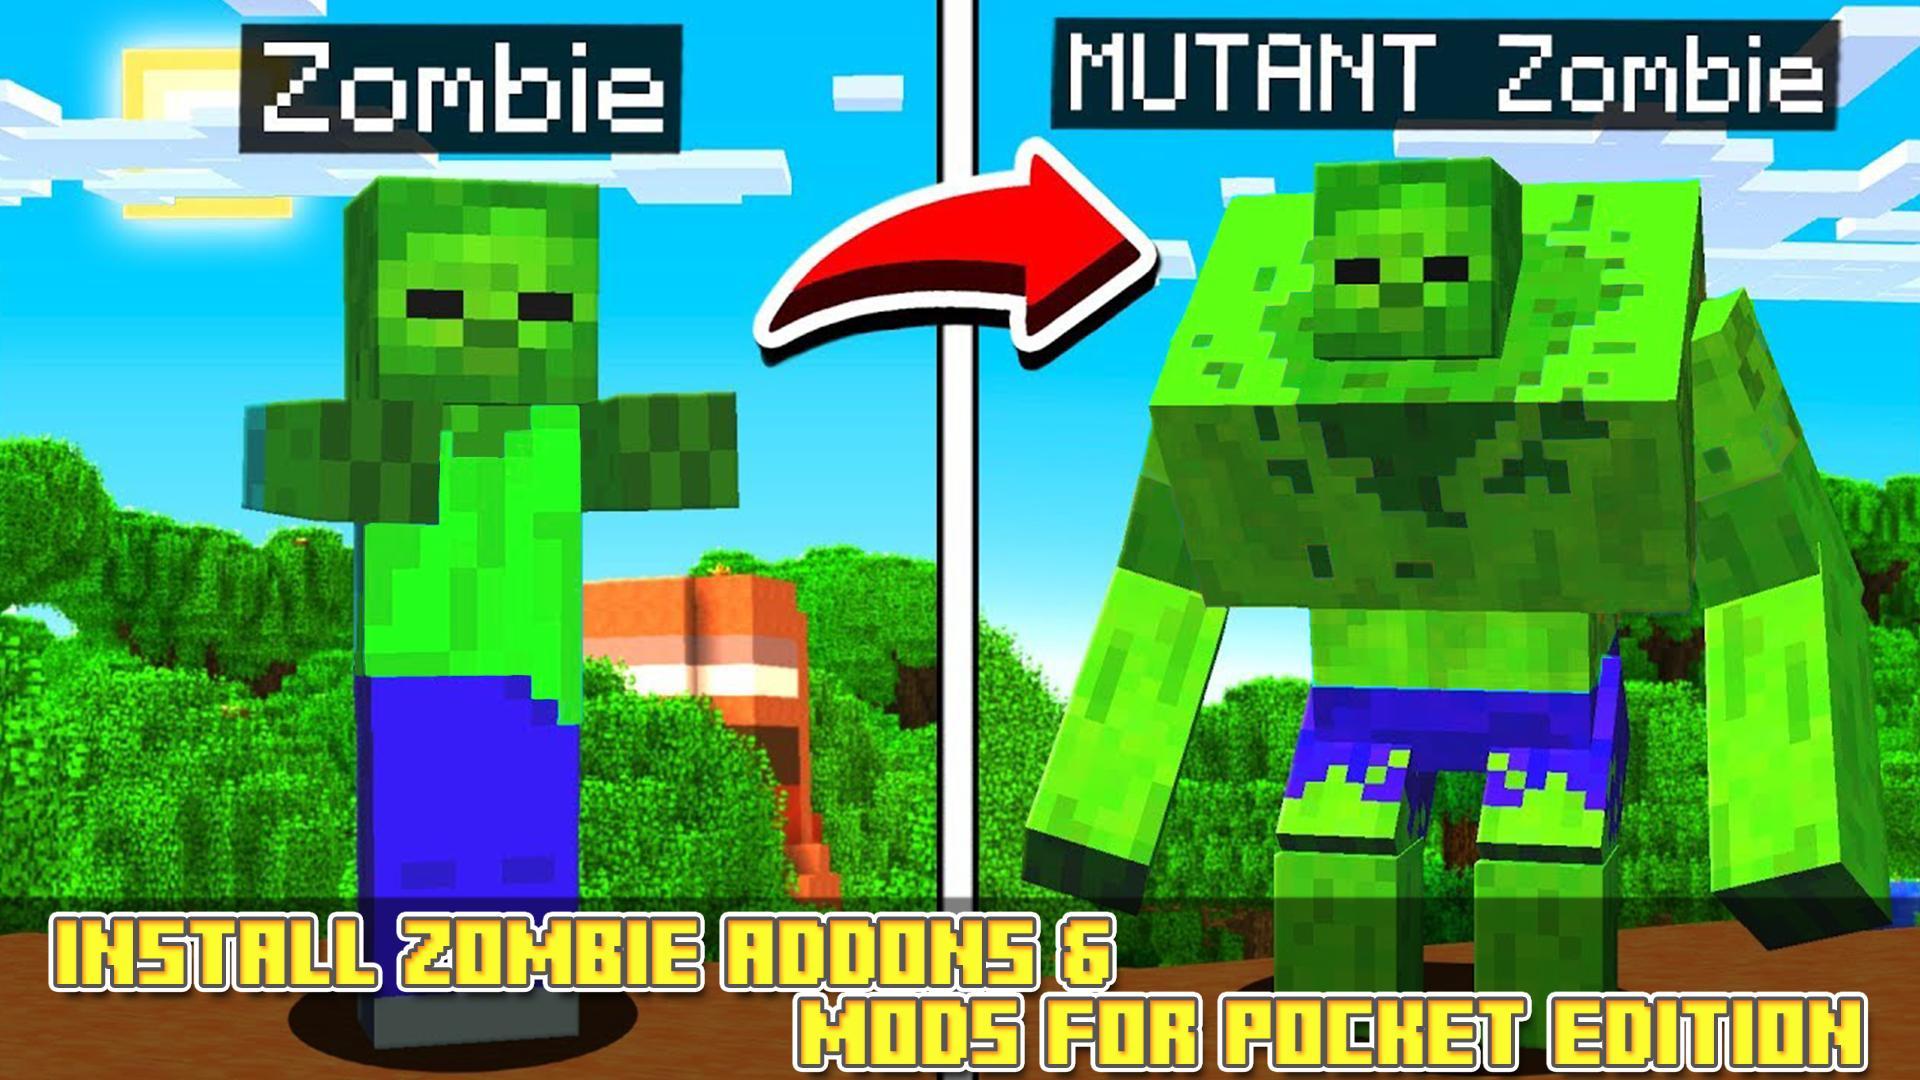 Mutant Mod - Zombie Addons and Mods 1.1 Screenshot 1